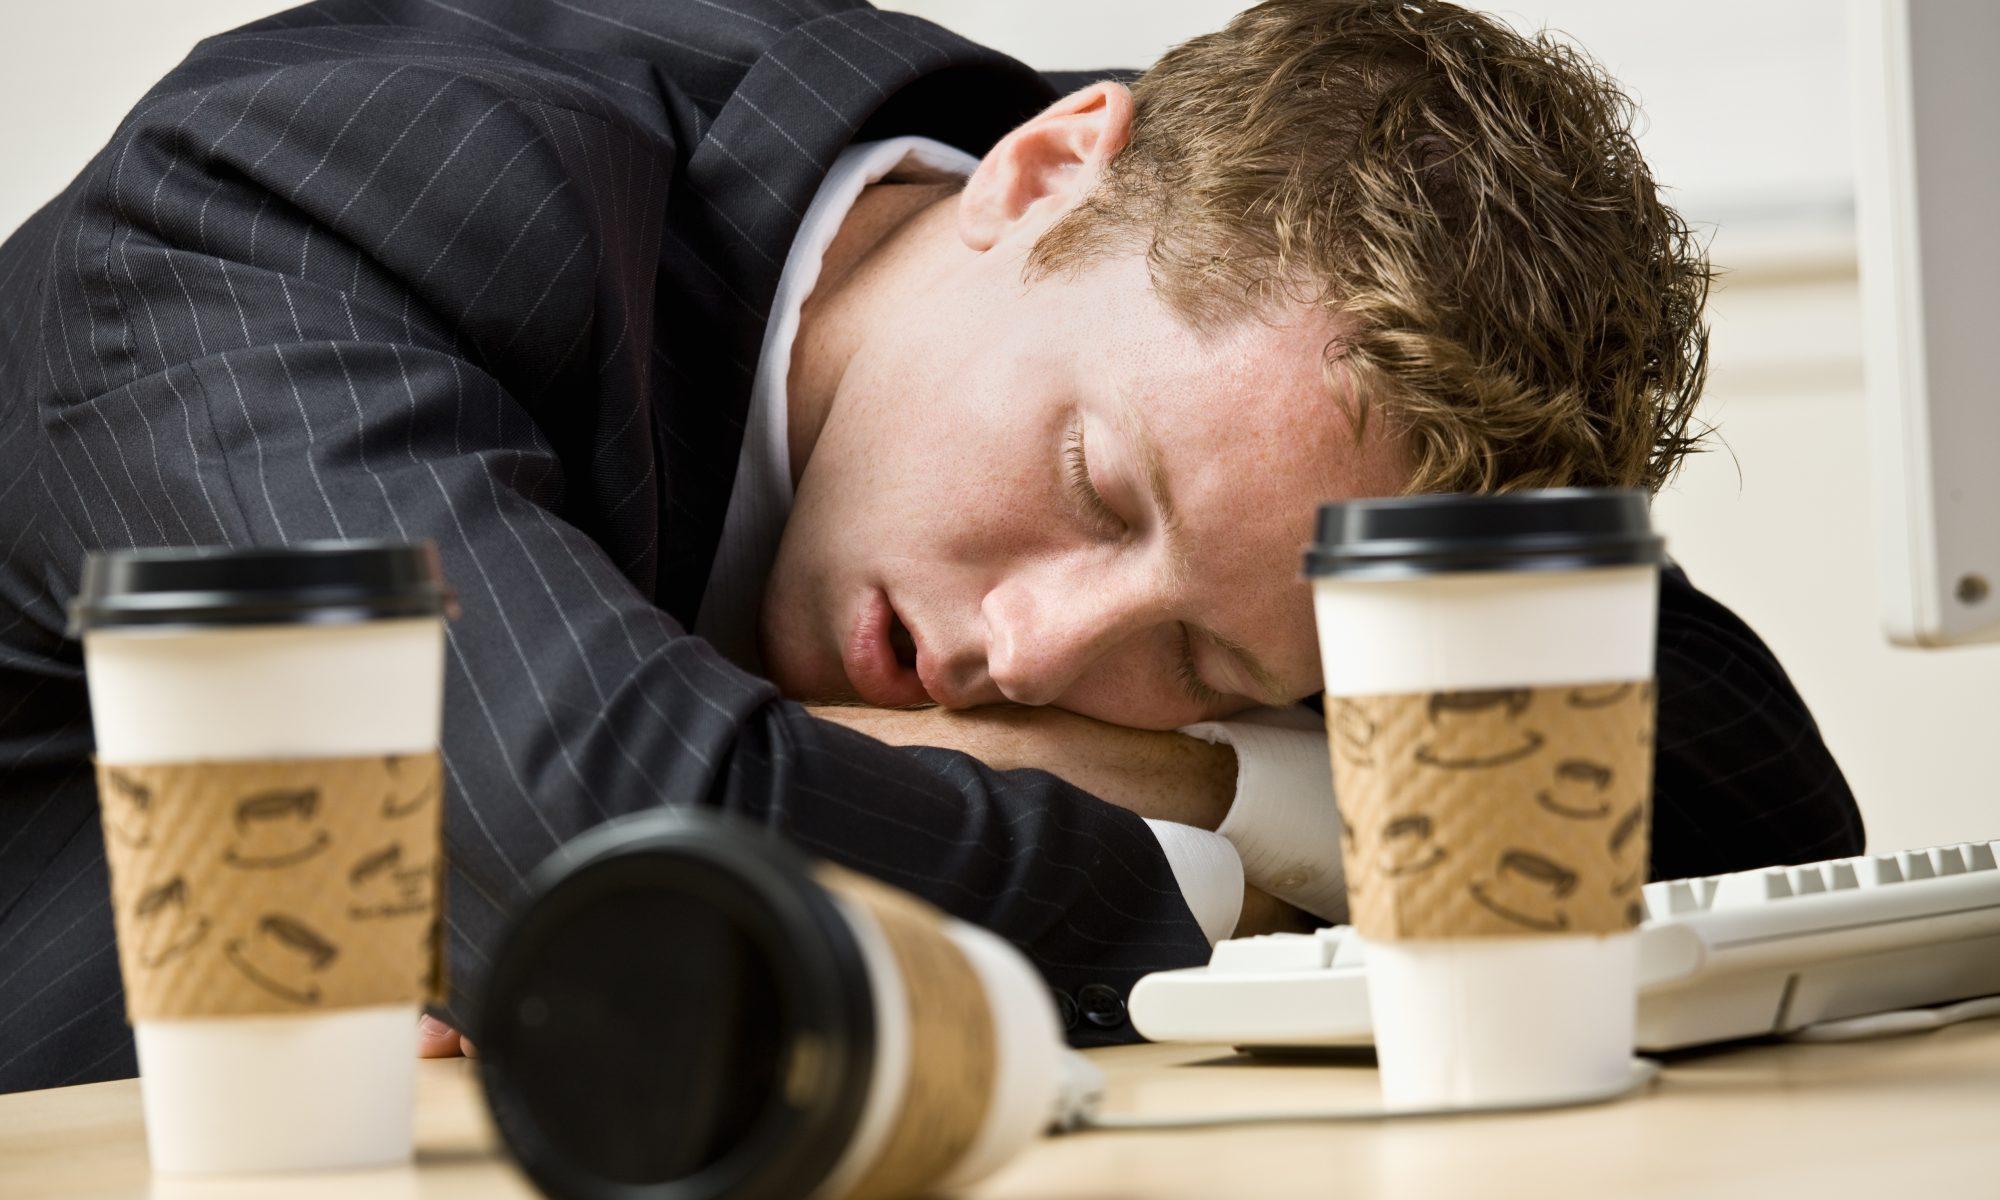 Work less, sleep more